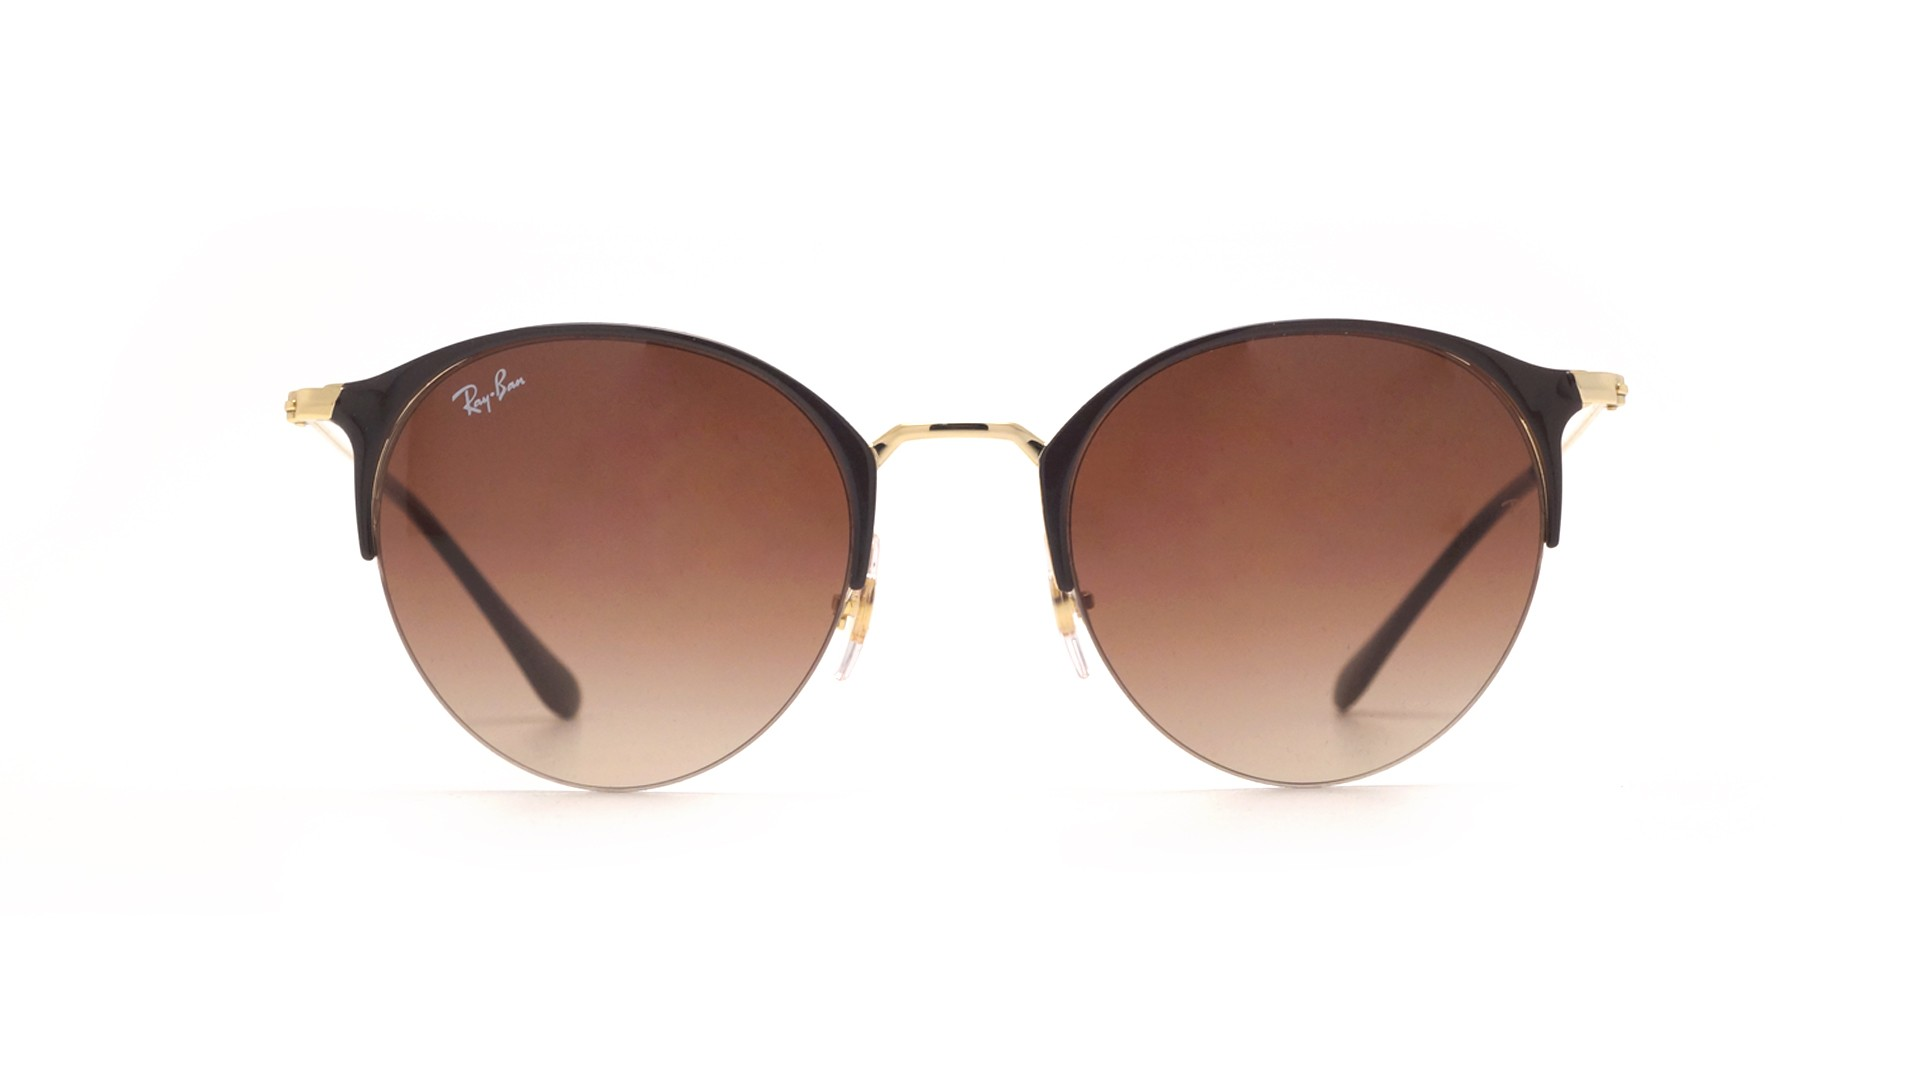 99375b978ef Sunglasses Ray-Ban RB3578 900913 50-22 Brown Medium Gradient